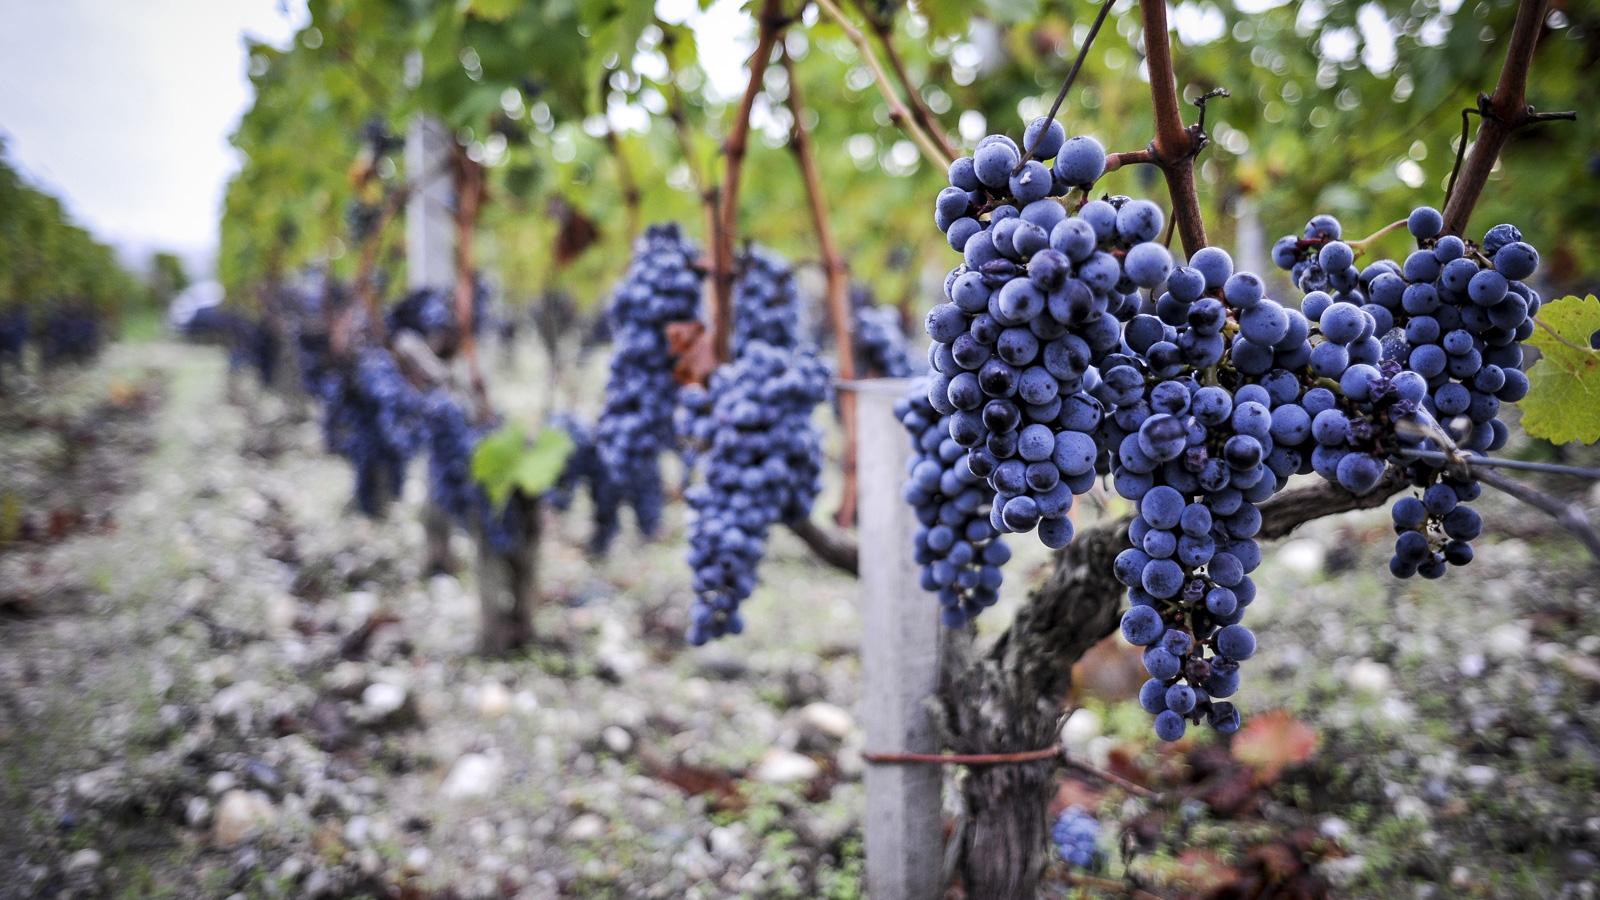 Vignoble-grappe-raisins